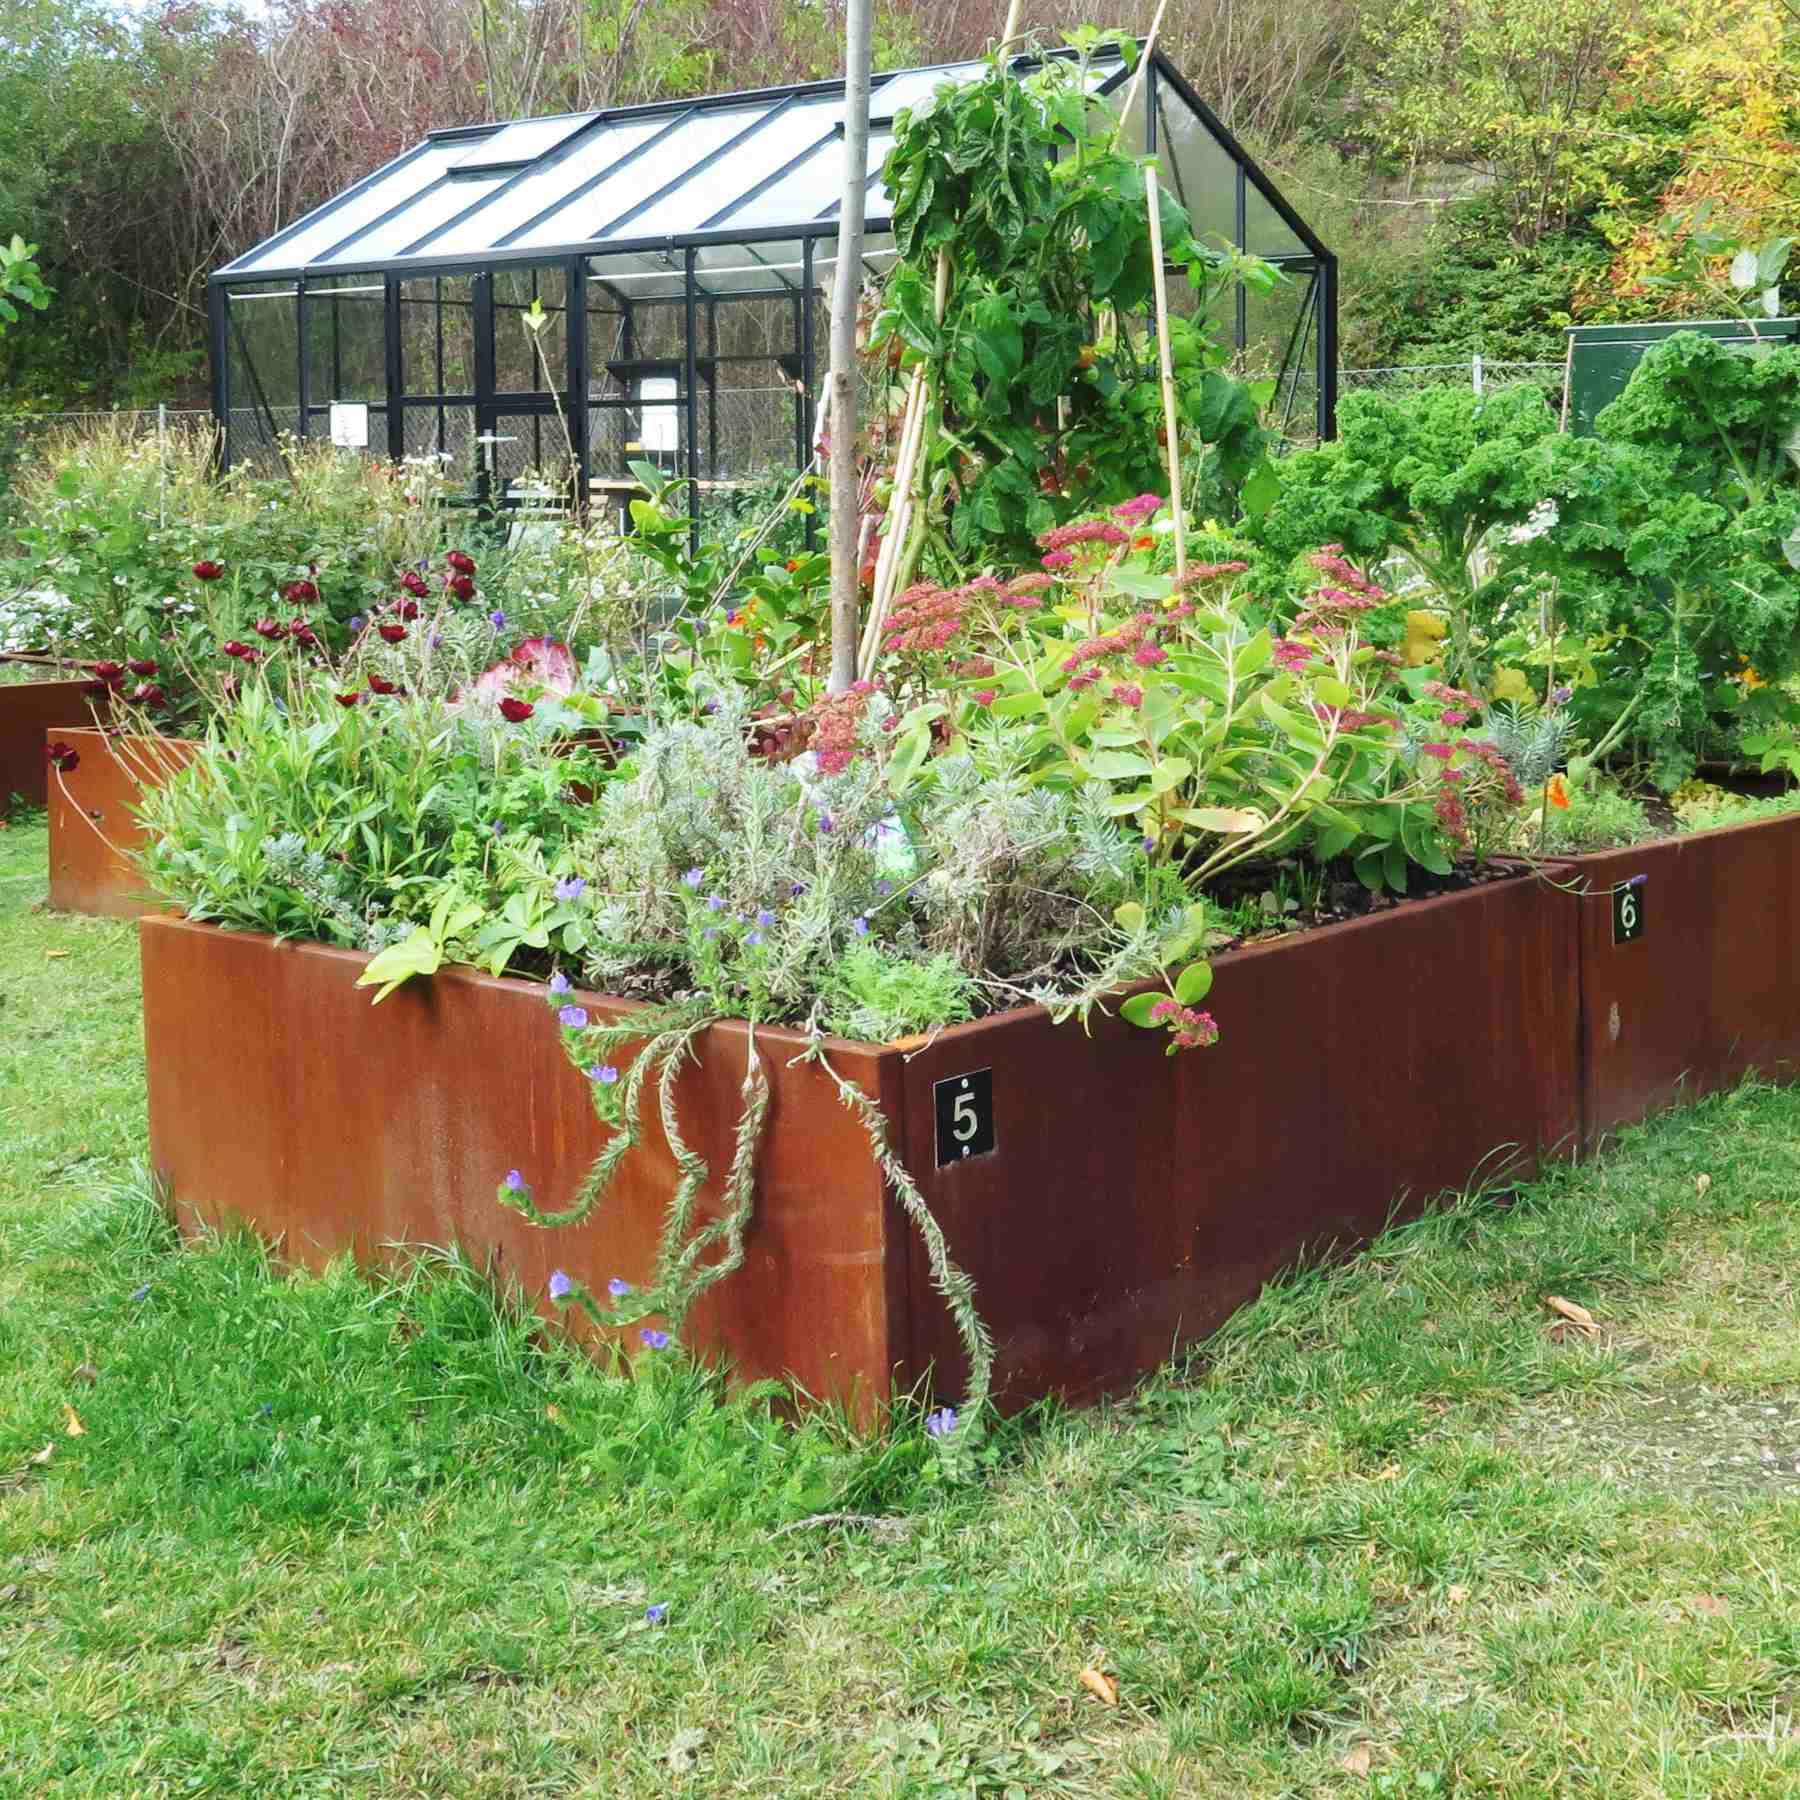 Plantekasser   med eller uden selvvanding   tagtomat